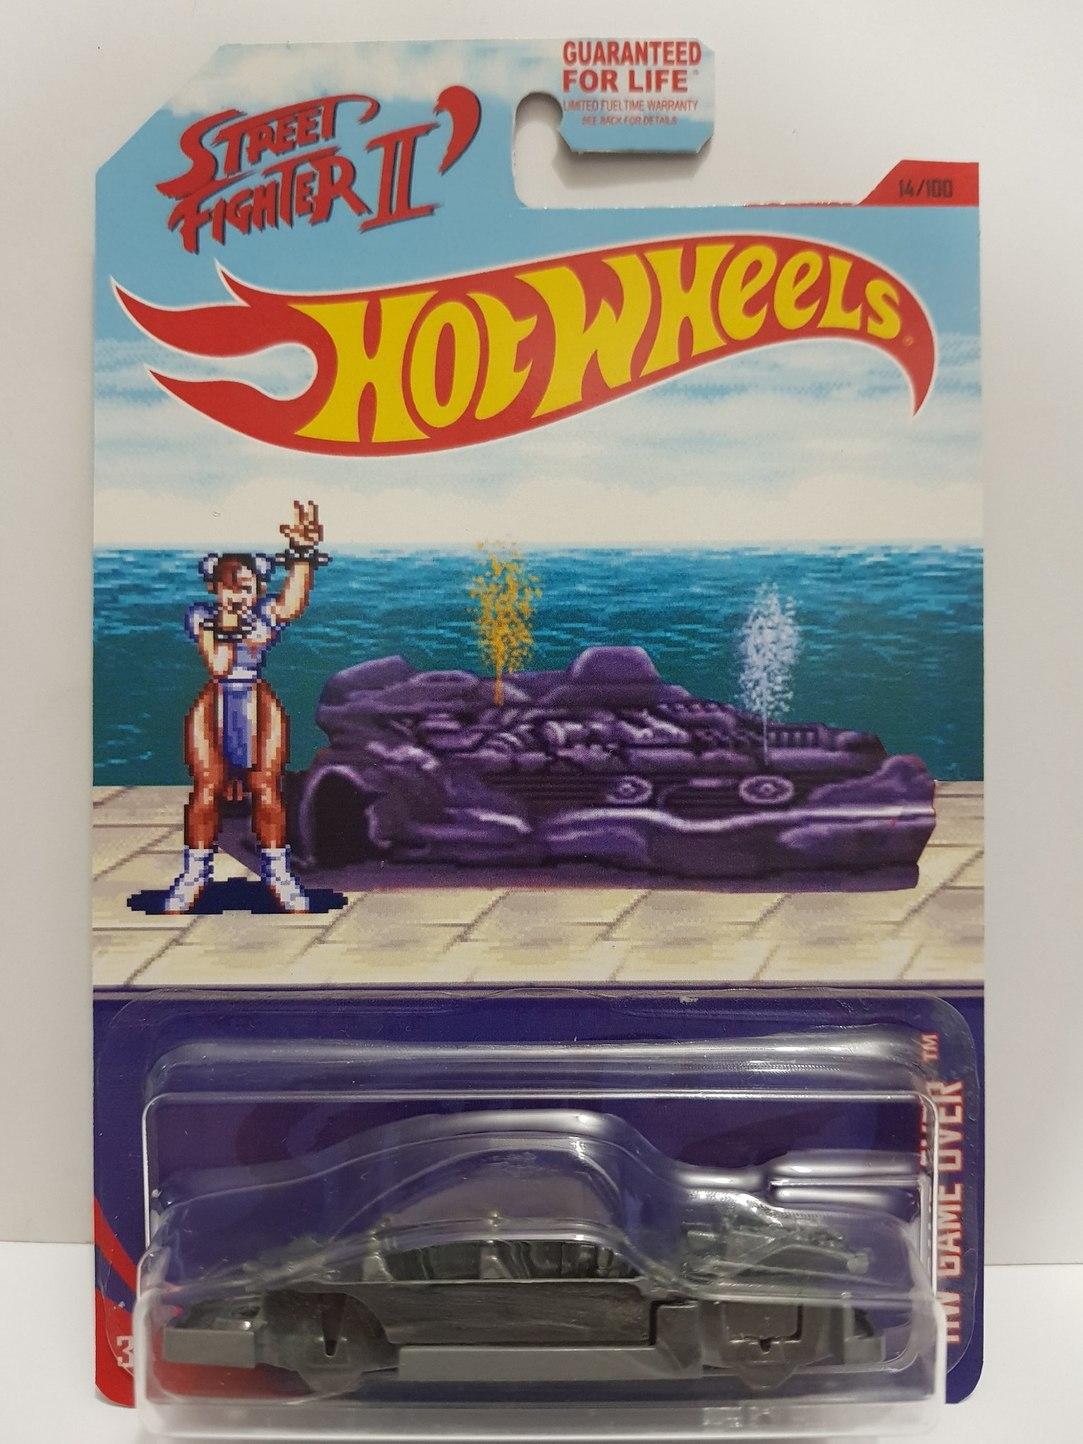 Street fighter 2 bonus car hotwheels - meme